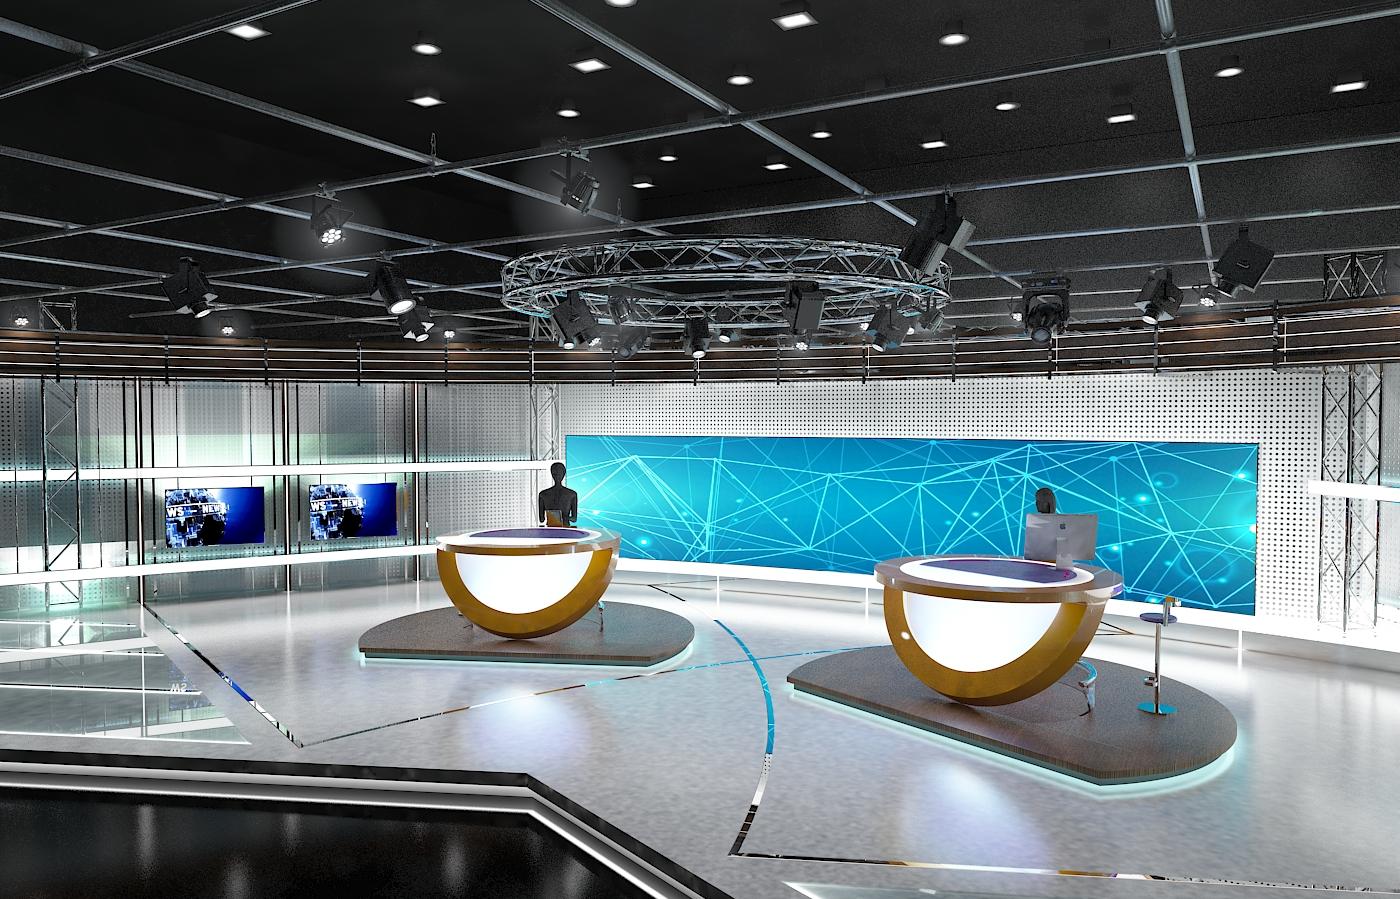 виртуал телевизийн студи цуглуулга vol 6 3d загвар max dxf dwg fbx obj 223399